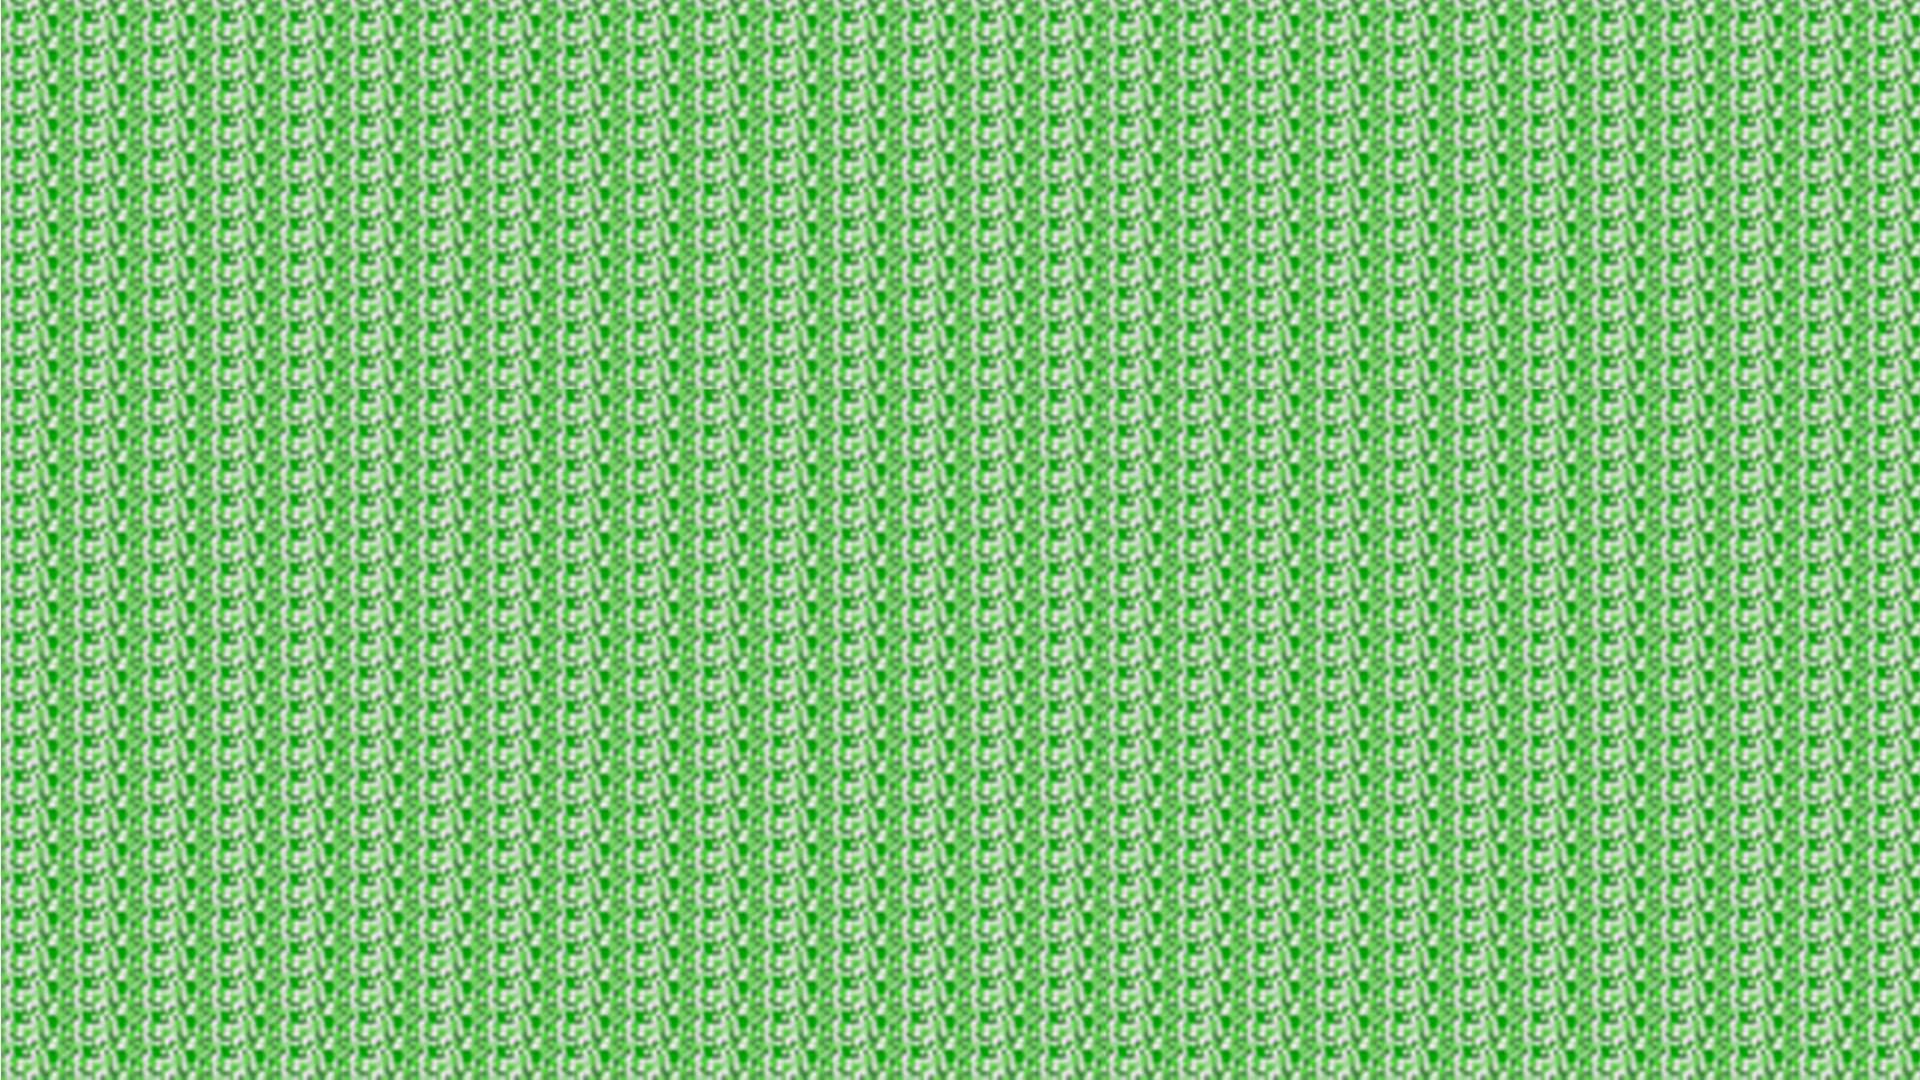 1920x1080 Creeper skin wallpaper by frostyvamp Creeper skin wallpaper by frostyvamp